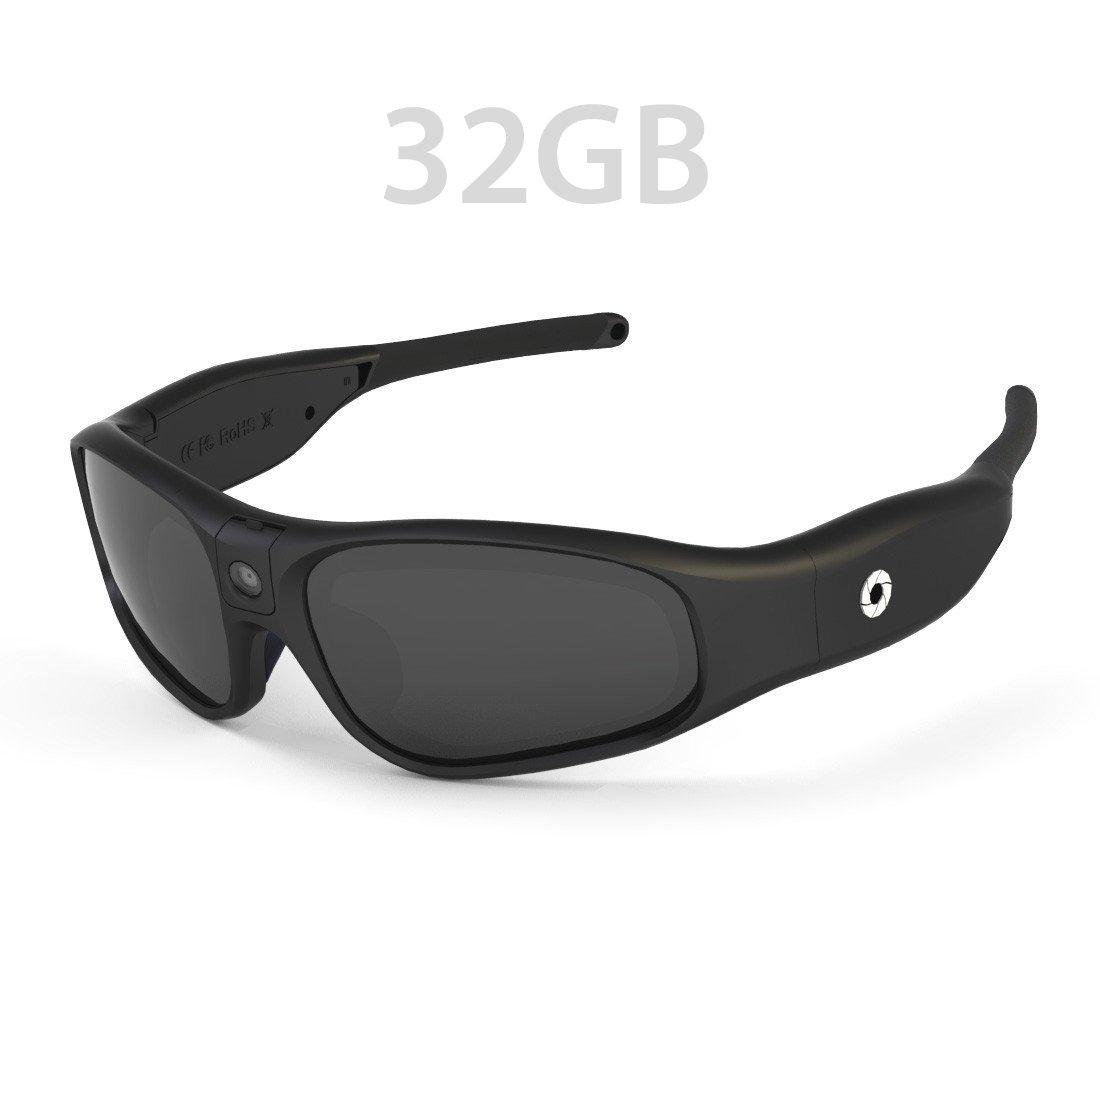 52f408005e Amazon.com   iVUE Rincon 1080P HD Camera Glasses Video Recording Sport  Sunglasses DVR Eyewear (Tilt Lens